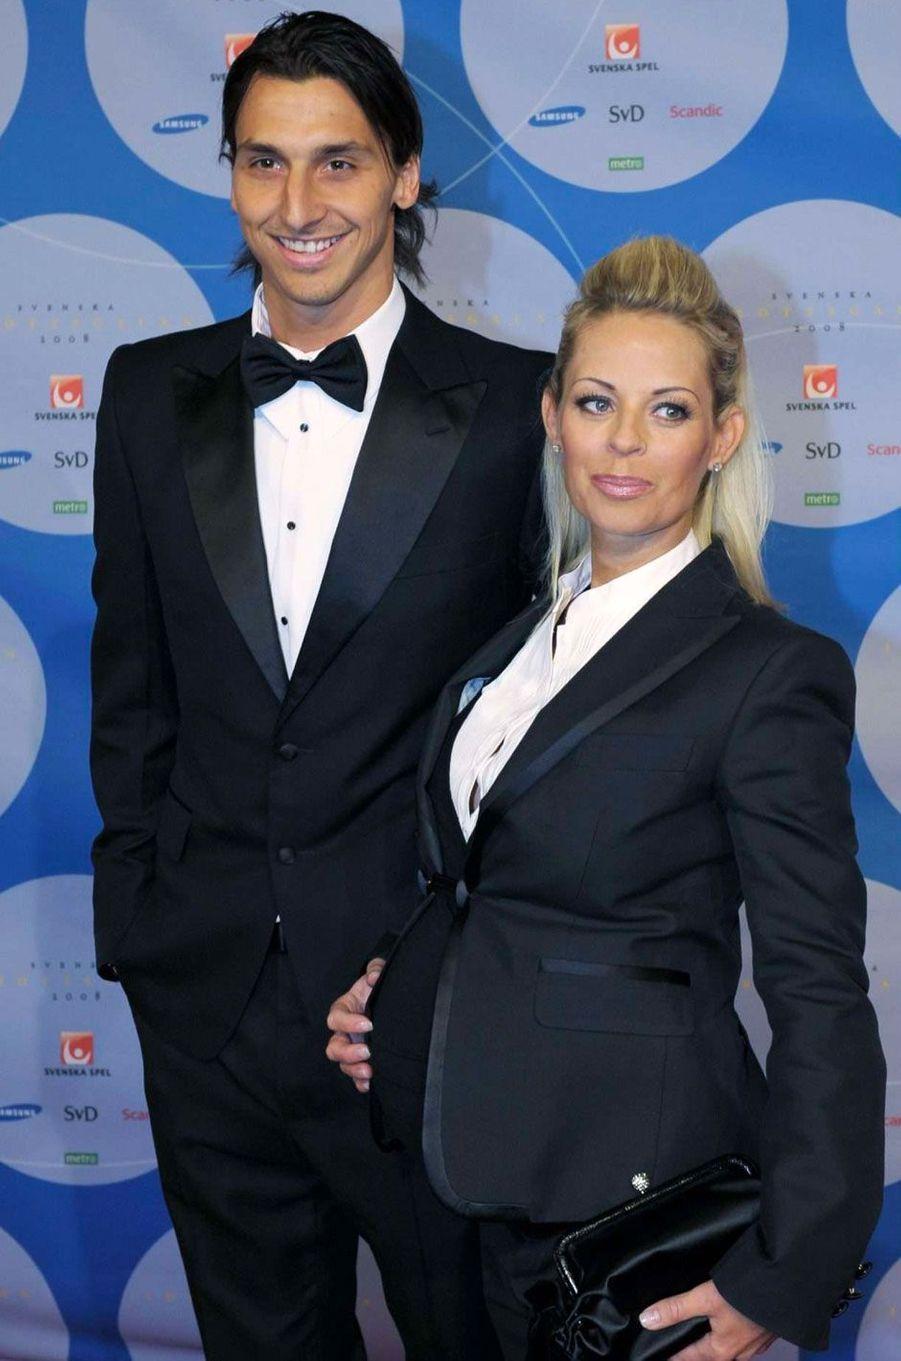 Zlatan Ibrahimovic et Helena Seger le 14 janvier 2008